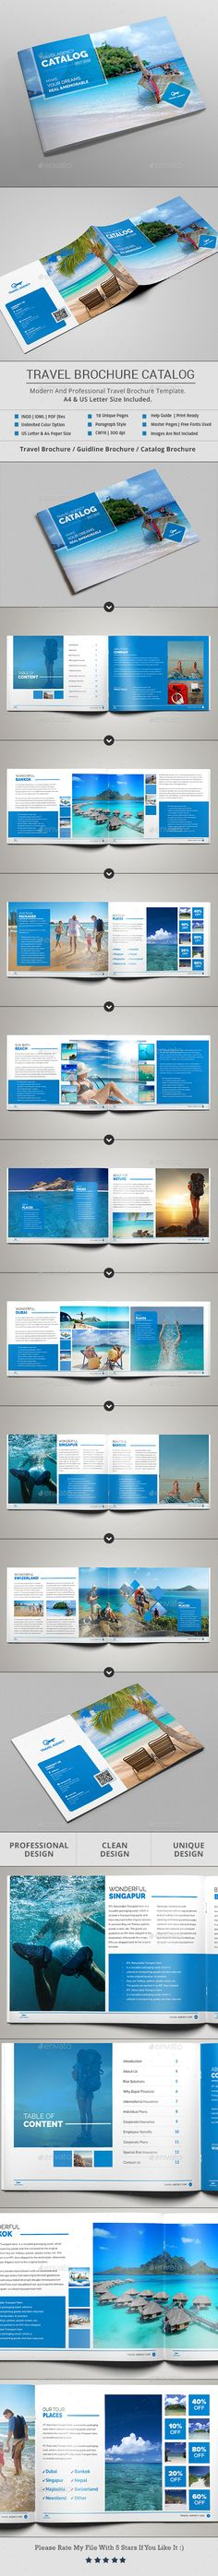 Travel Brochure & Catalog Template — InDesign INDD #11x8.5 #creative brochure • Download ➝ https://graphicriver.net/item/travel-brochure-catalog-template/18924677?ref=pxcr